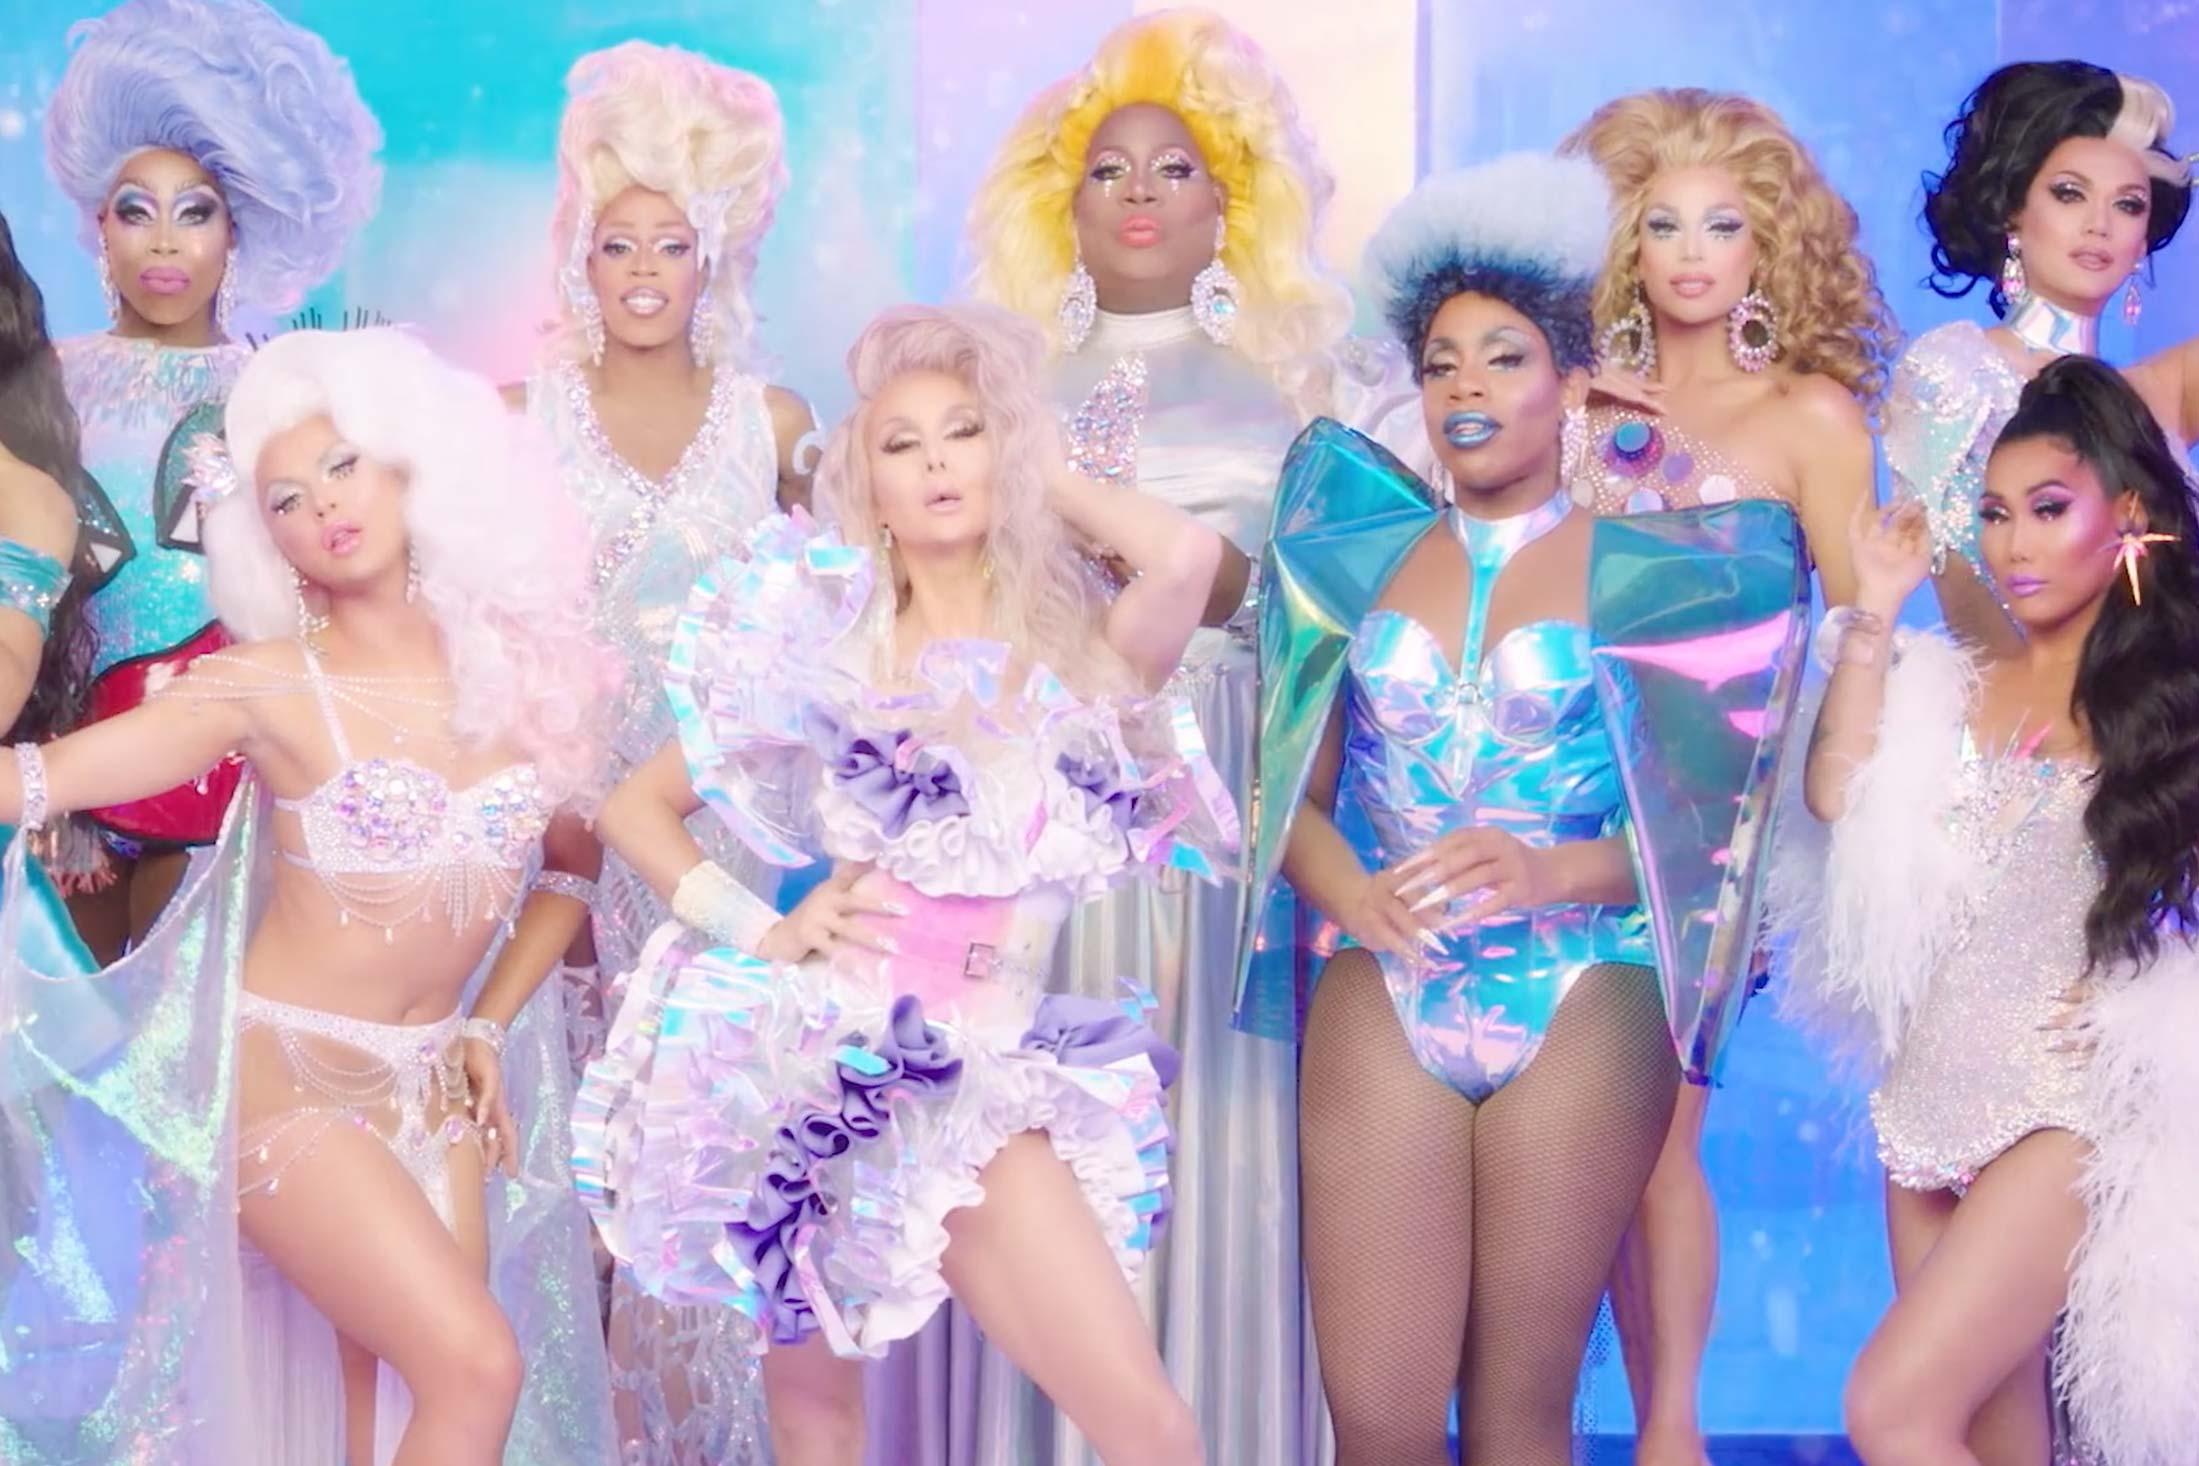 The contestants on RuPaul's Drag Race All Stars 4.